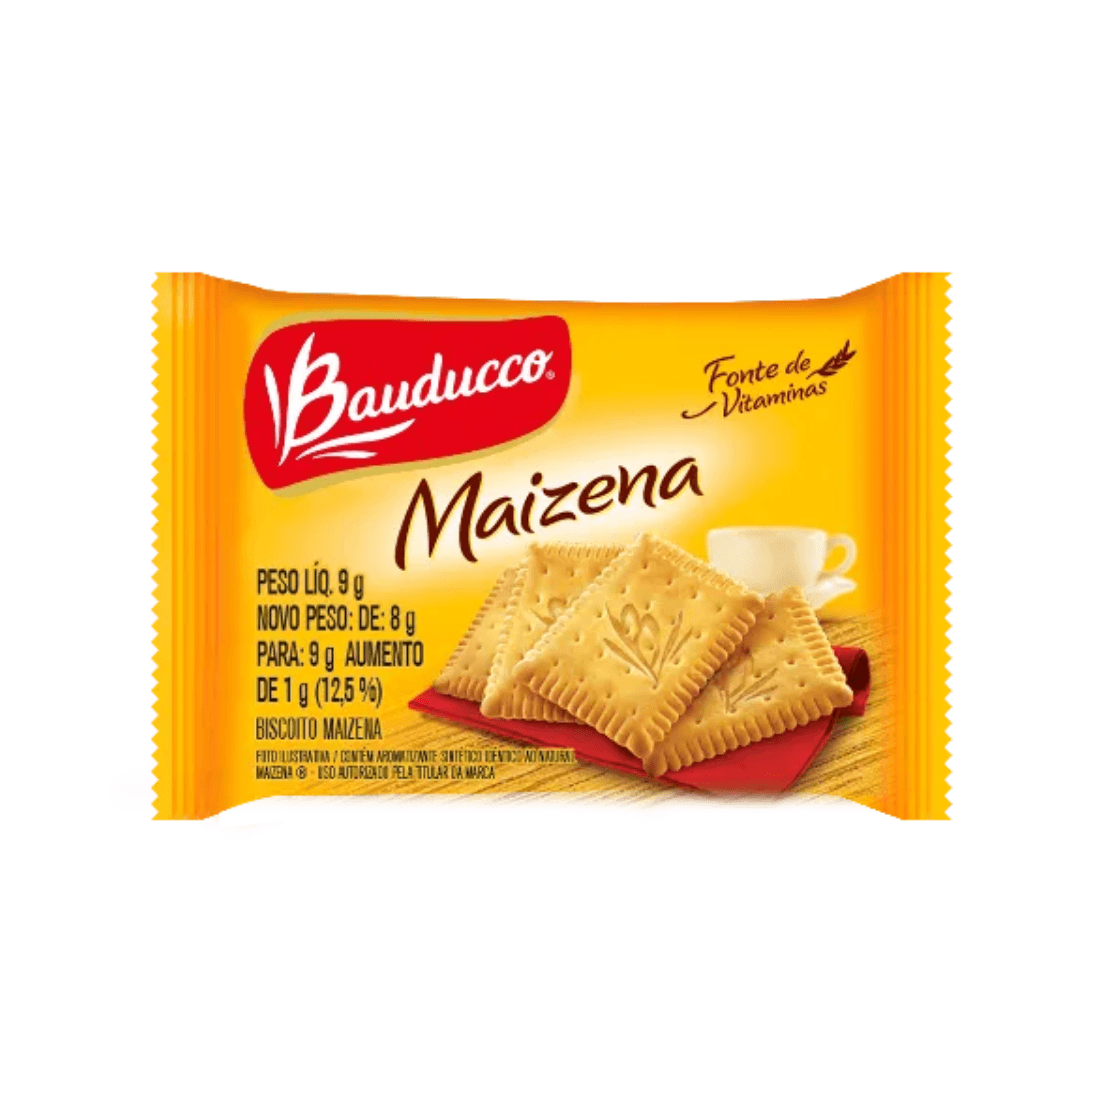 BISCOITO MAIZENA BAUDUCCO SACHÊ 9G CAIXA 410 UNIDADES